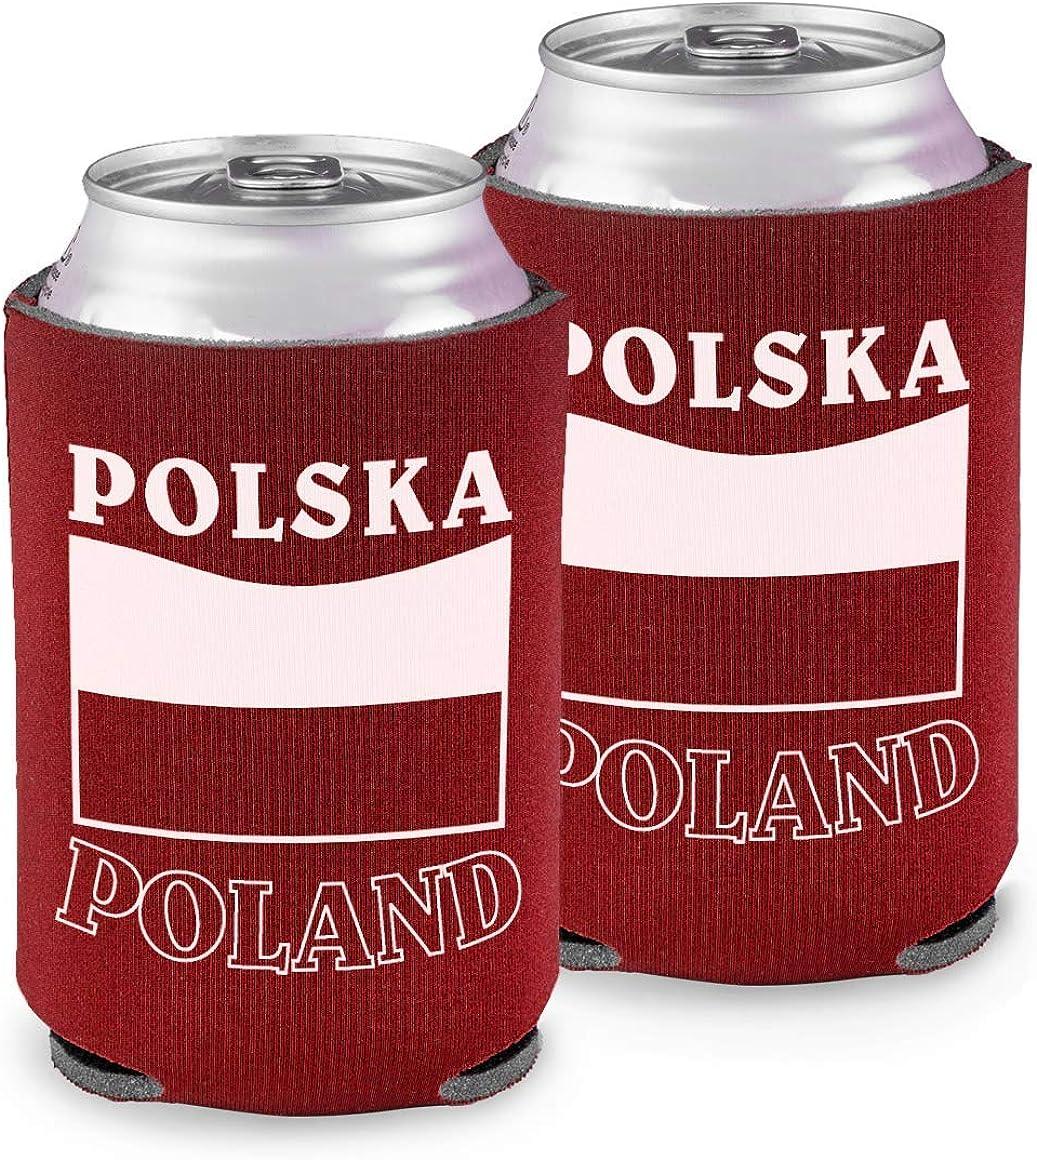 Soda Can or Beer Holder with Polska and Poland Around Polish Flag, Set of 2